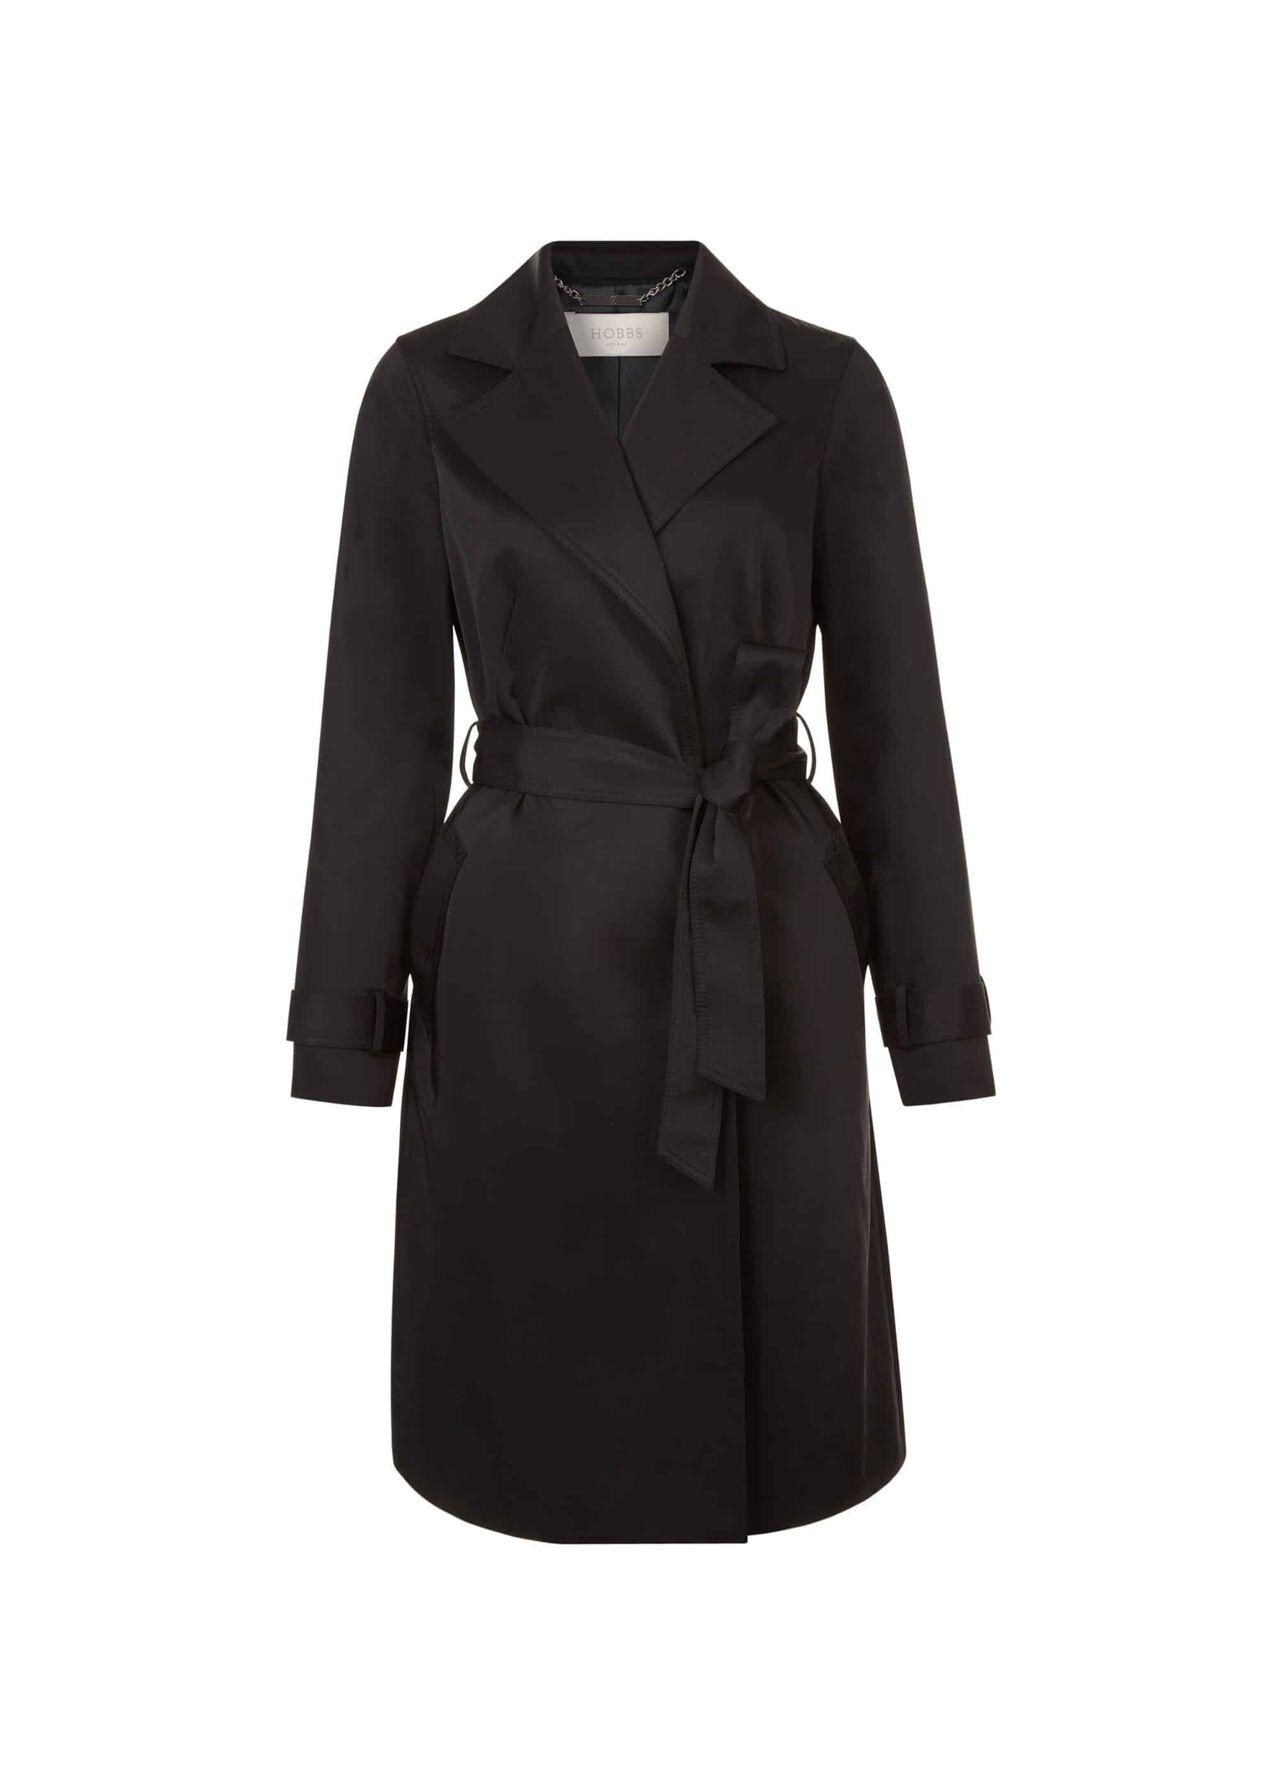 TianaWater-Resistant Trench Coat Black